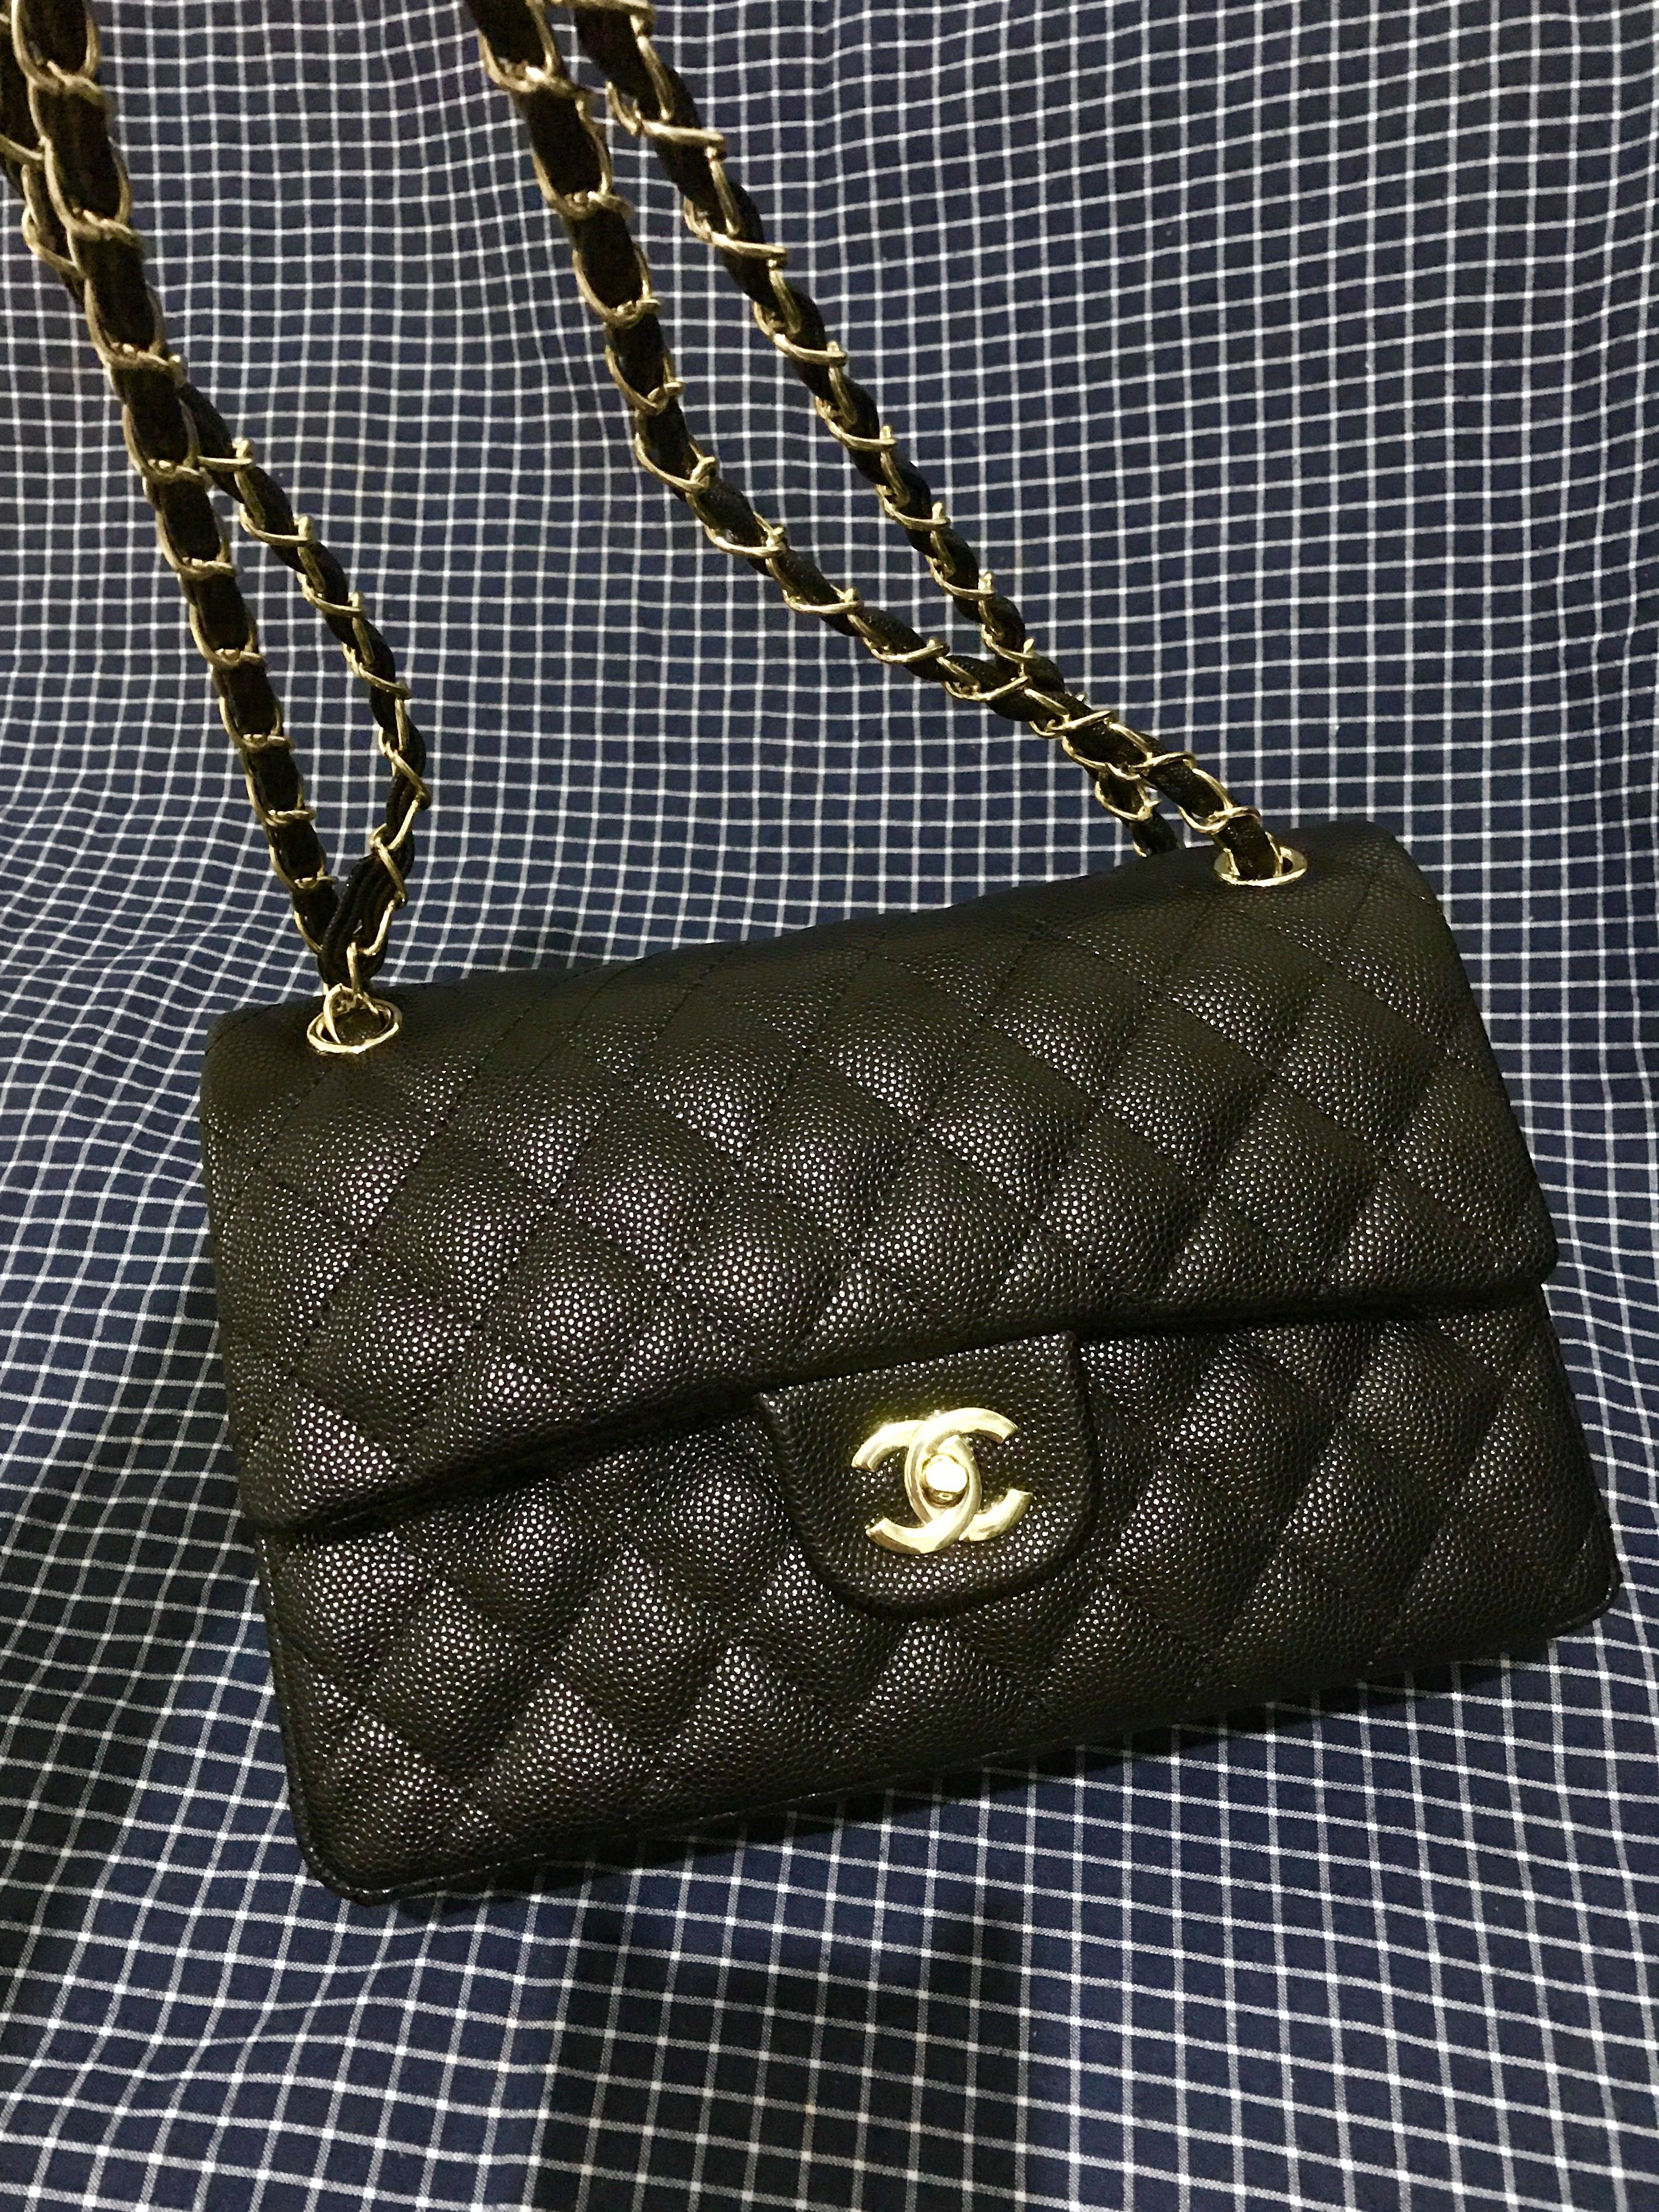 2afae38dedc4 Chanel Classic Flap in Black Caviar GHW (Replica)